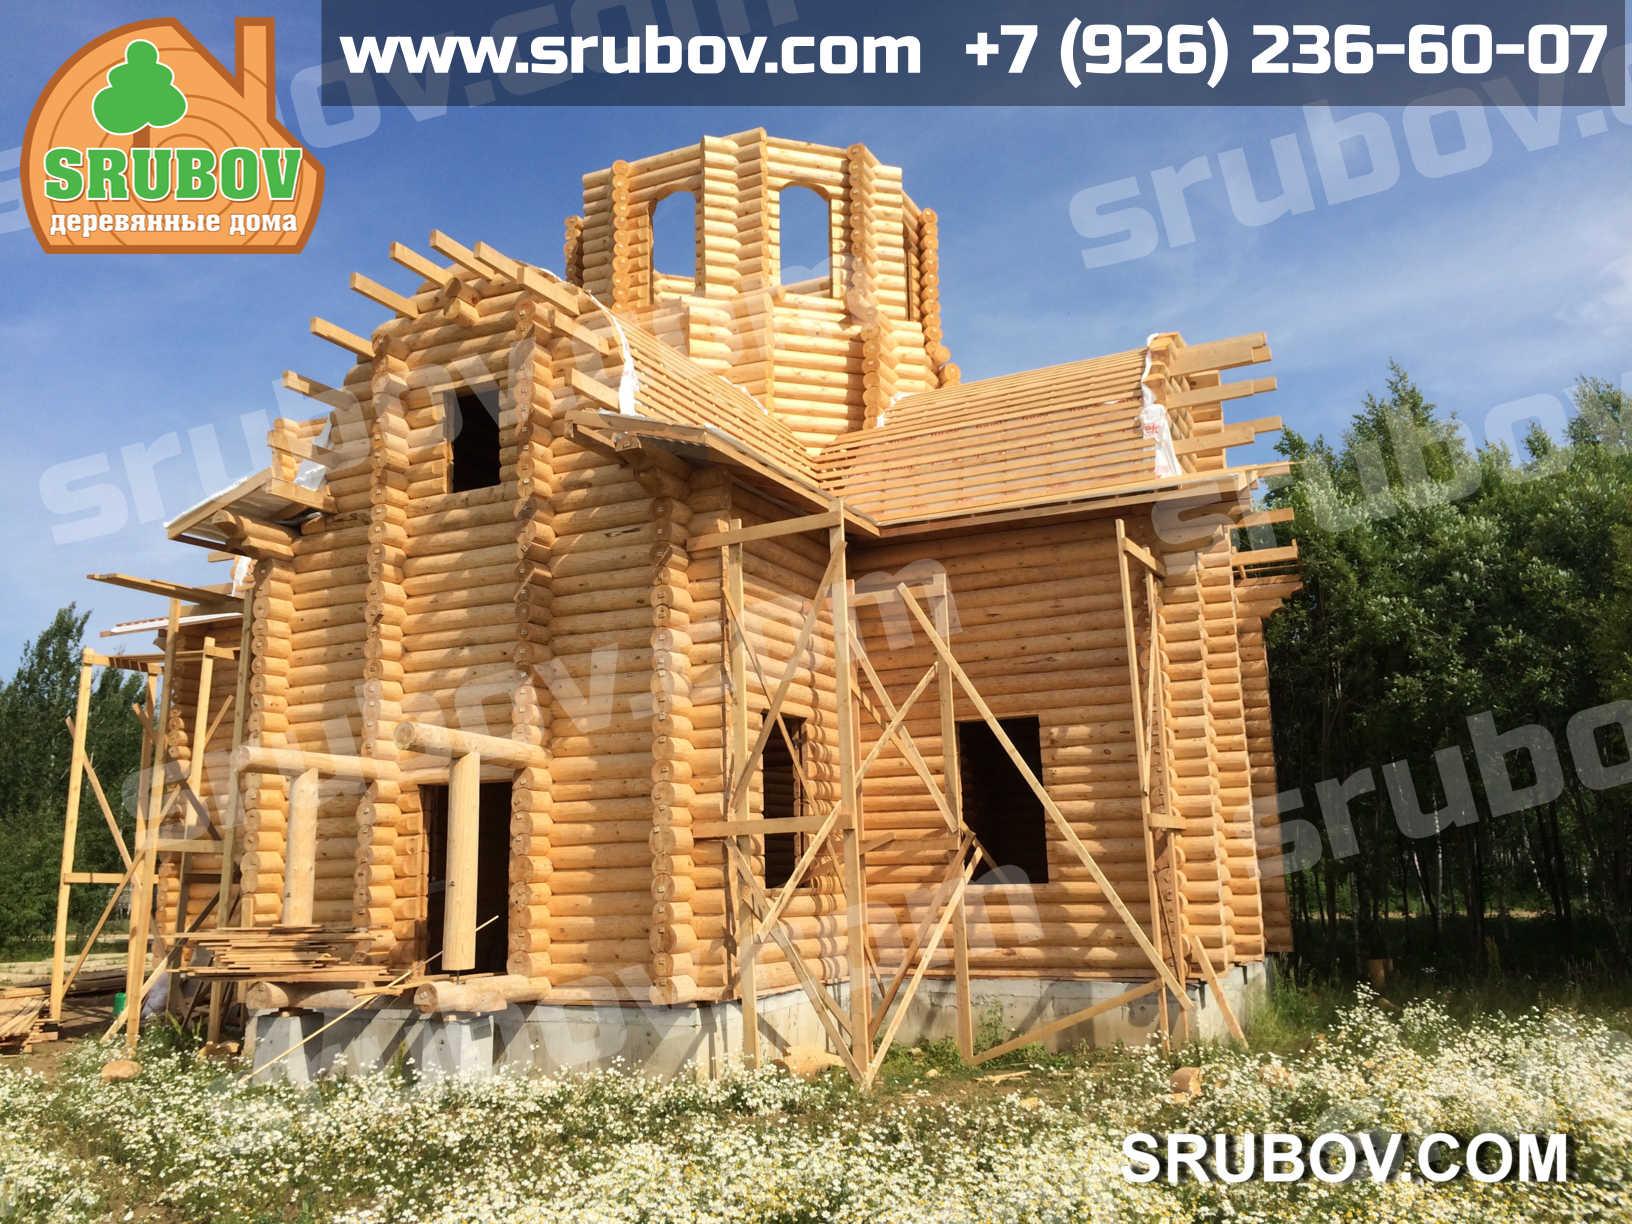 Храм 2 - www.srubov.com